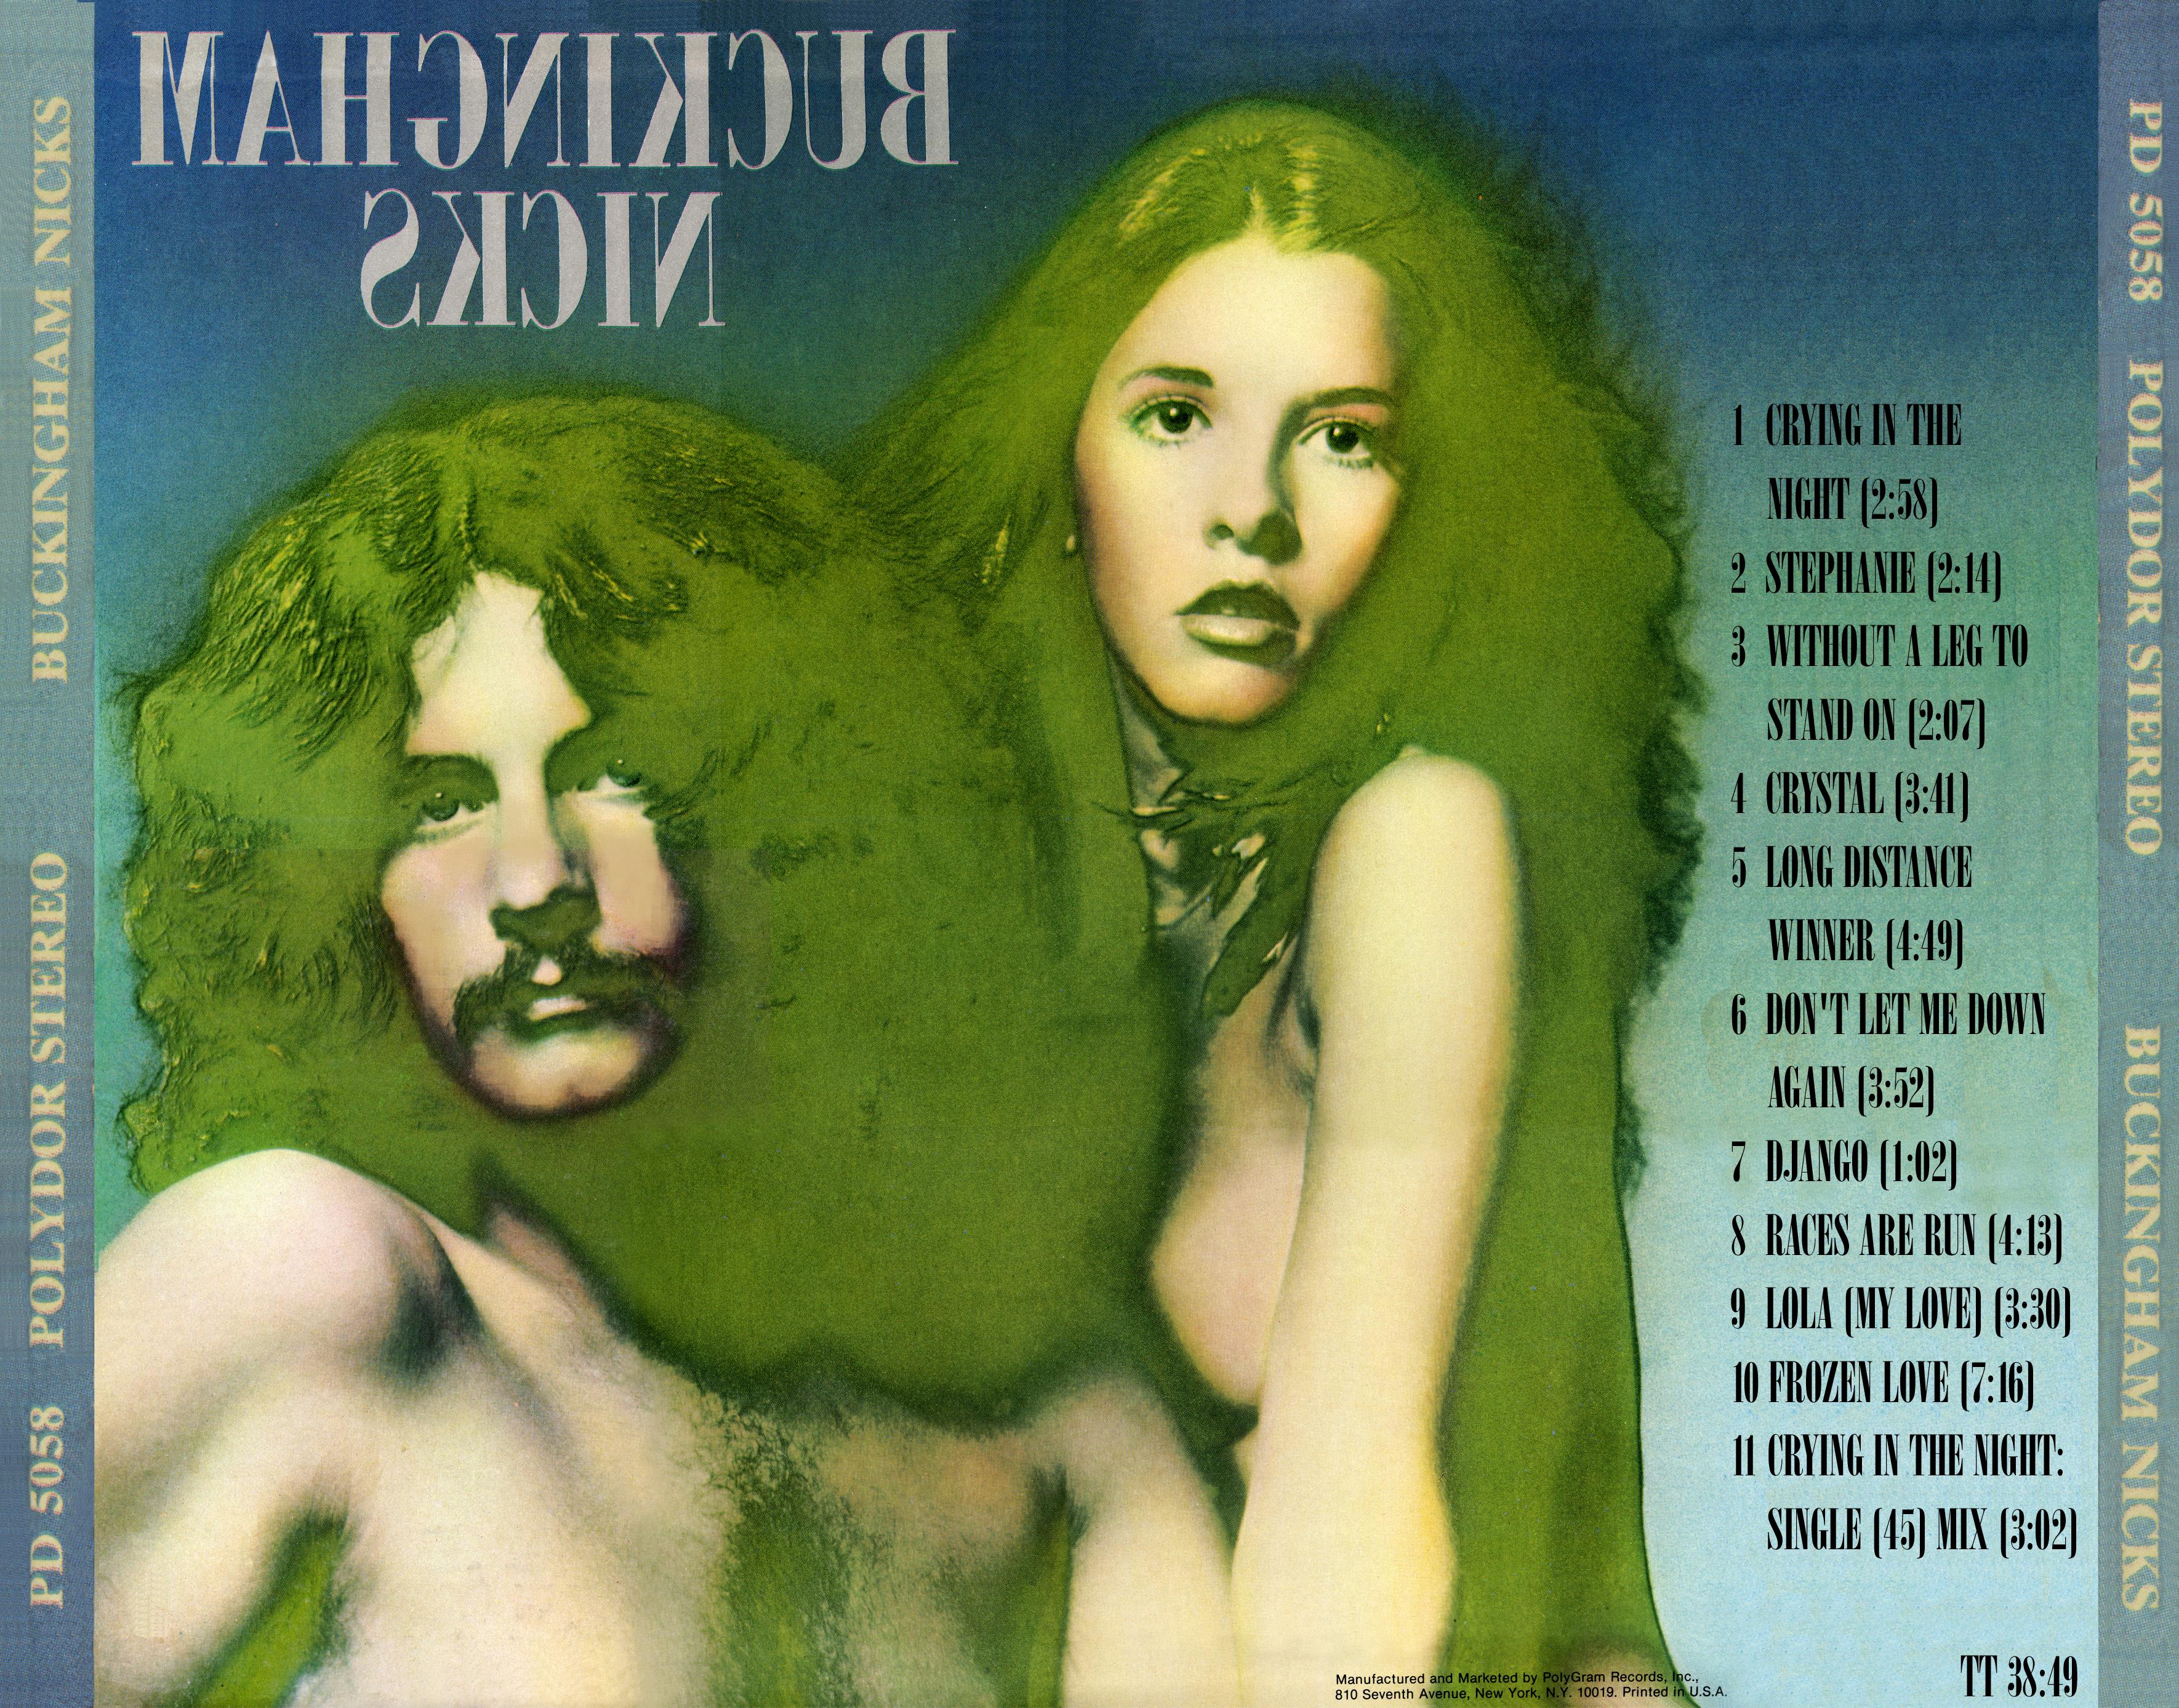 Buckingham Nicks CD Artwork